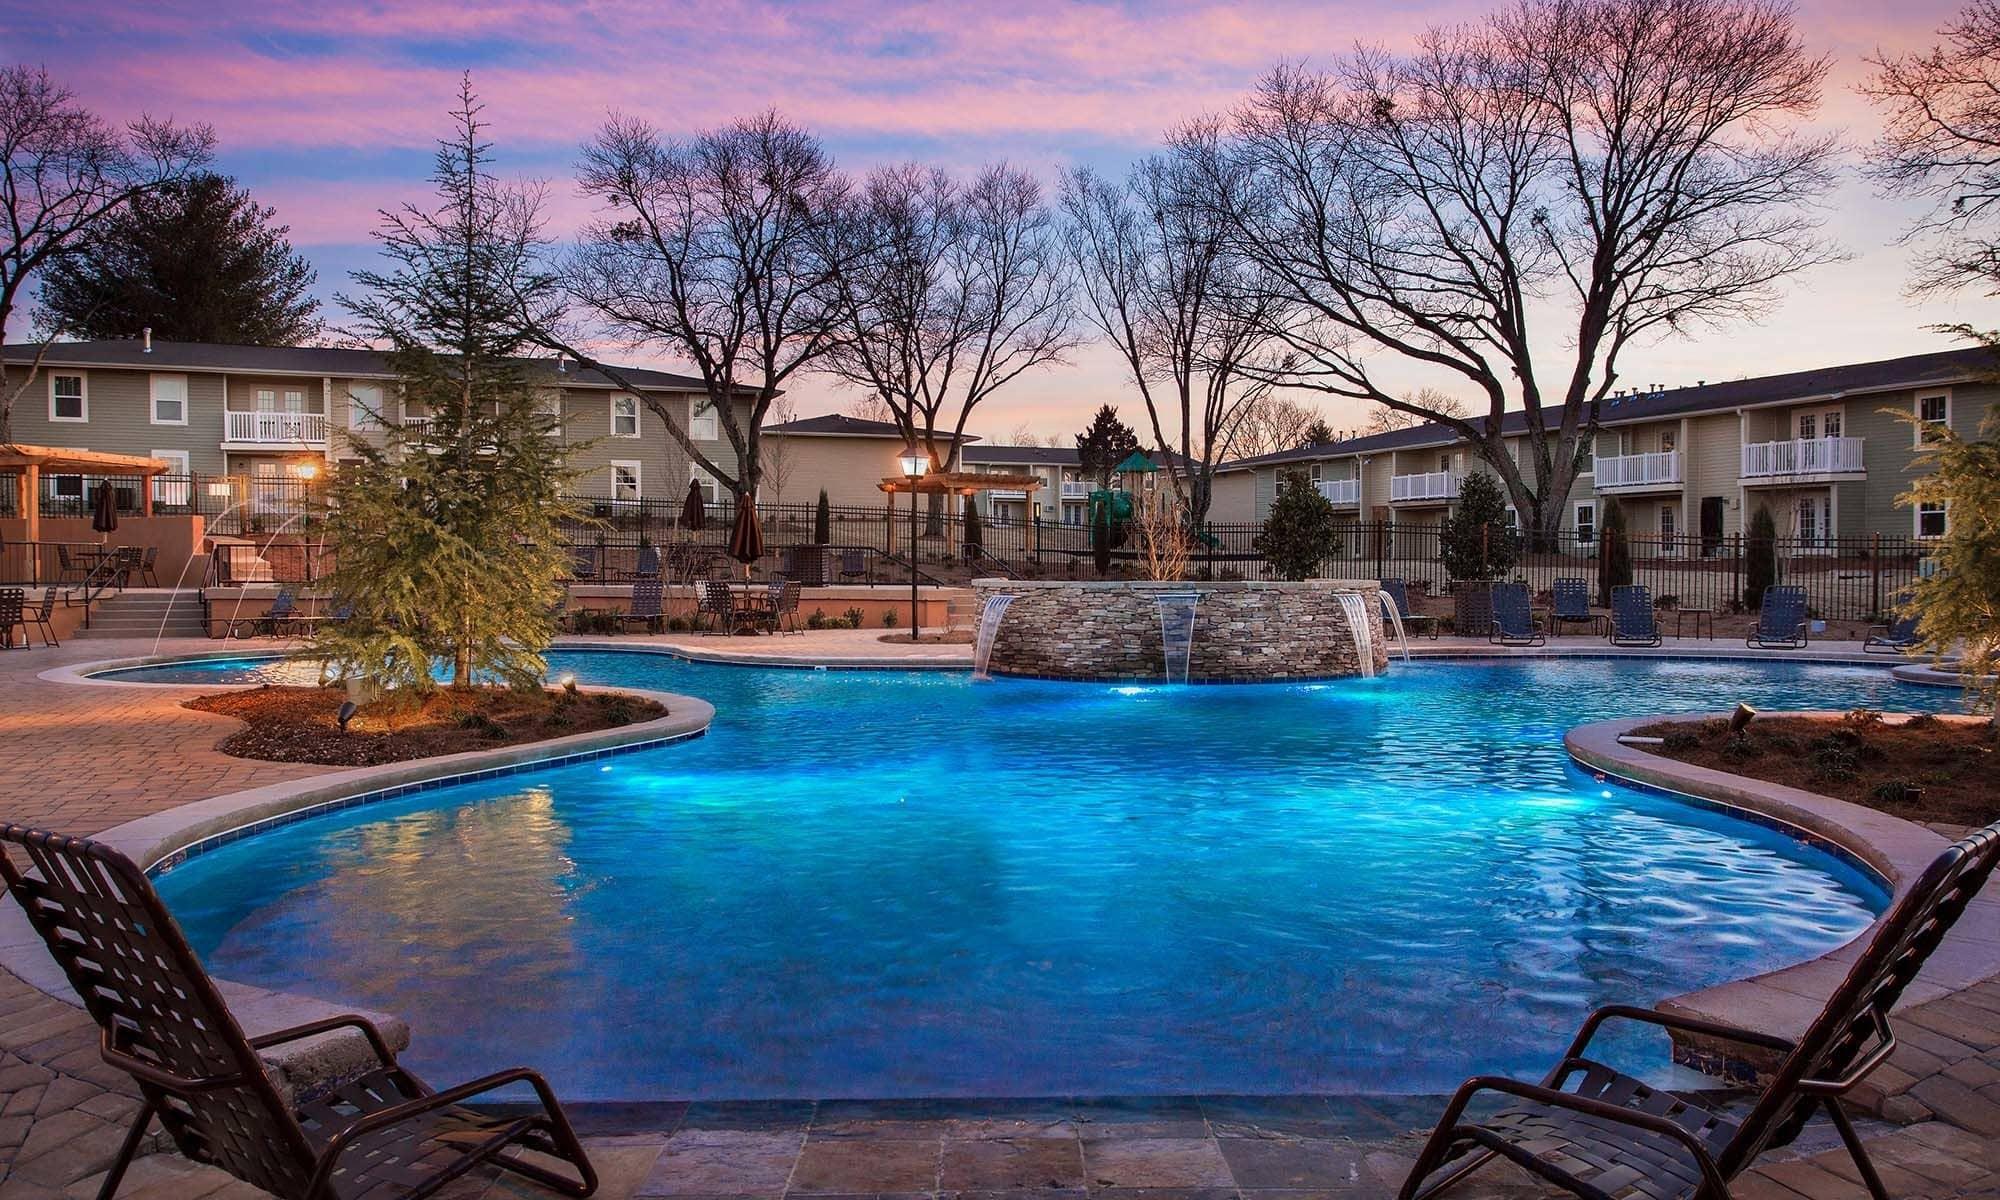 Swimming pool at night at Fern Parc Apartment Homes in Huntsville, AL